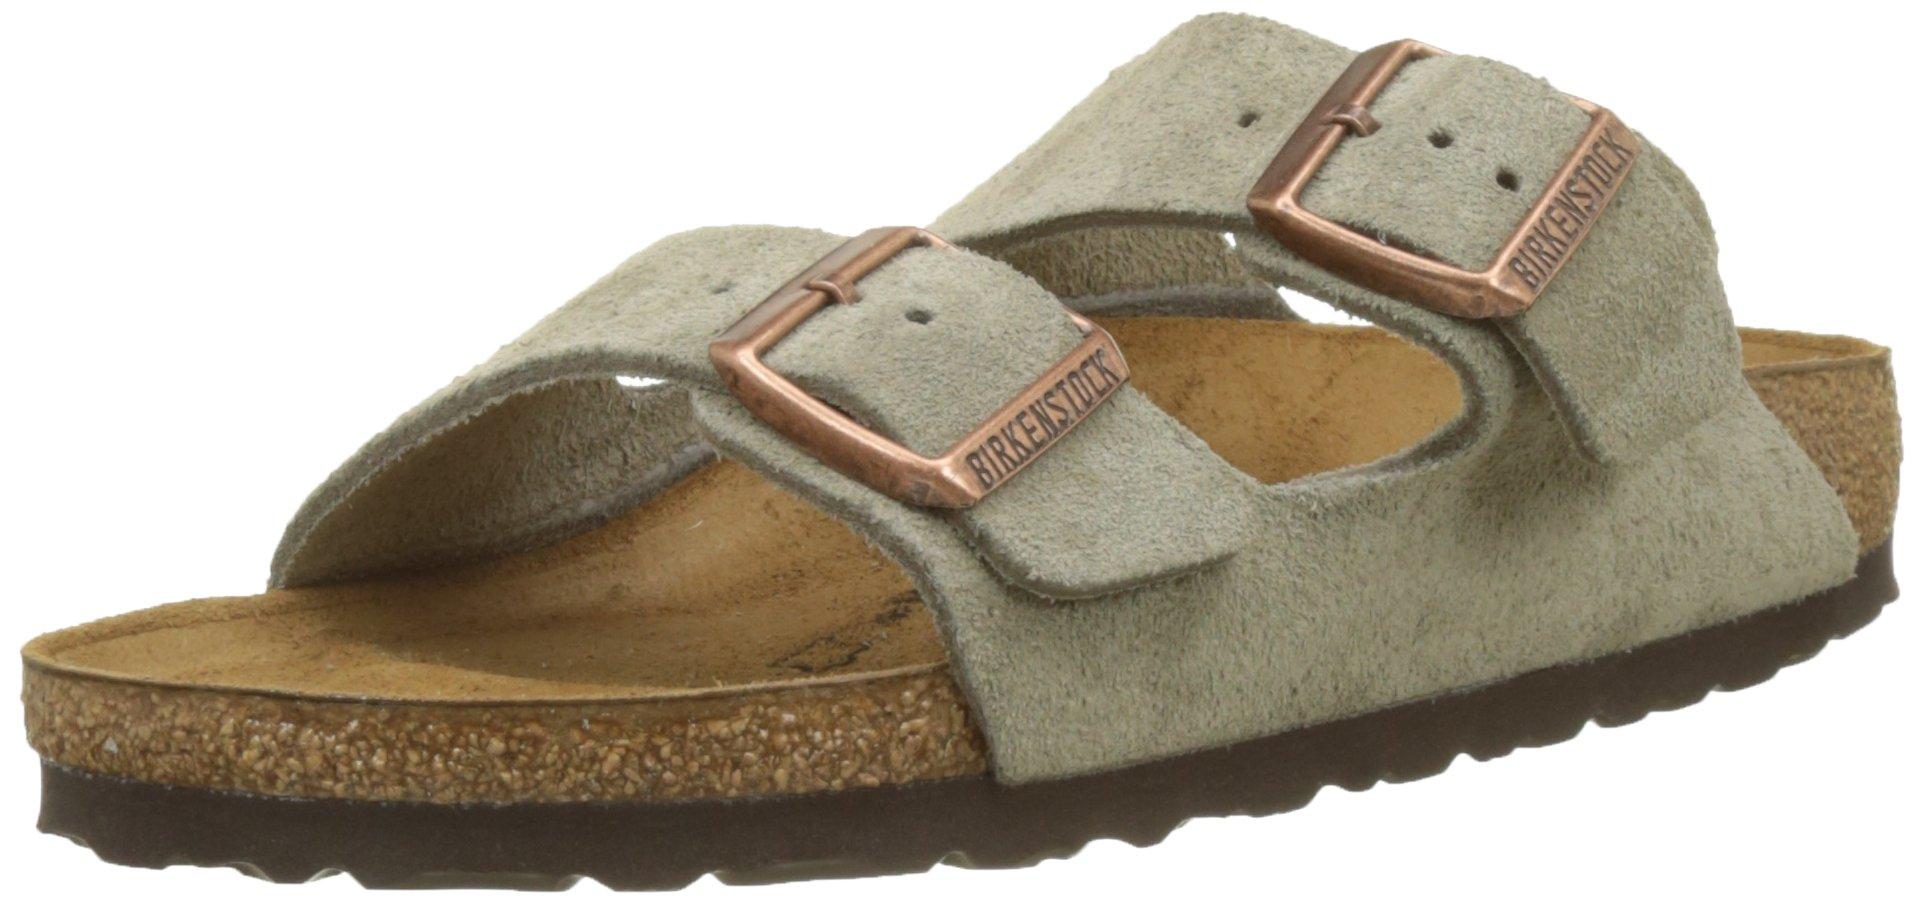 Birkenstock Unisex Arizona Soft Footbed Sandals Taupe